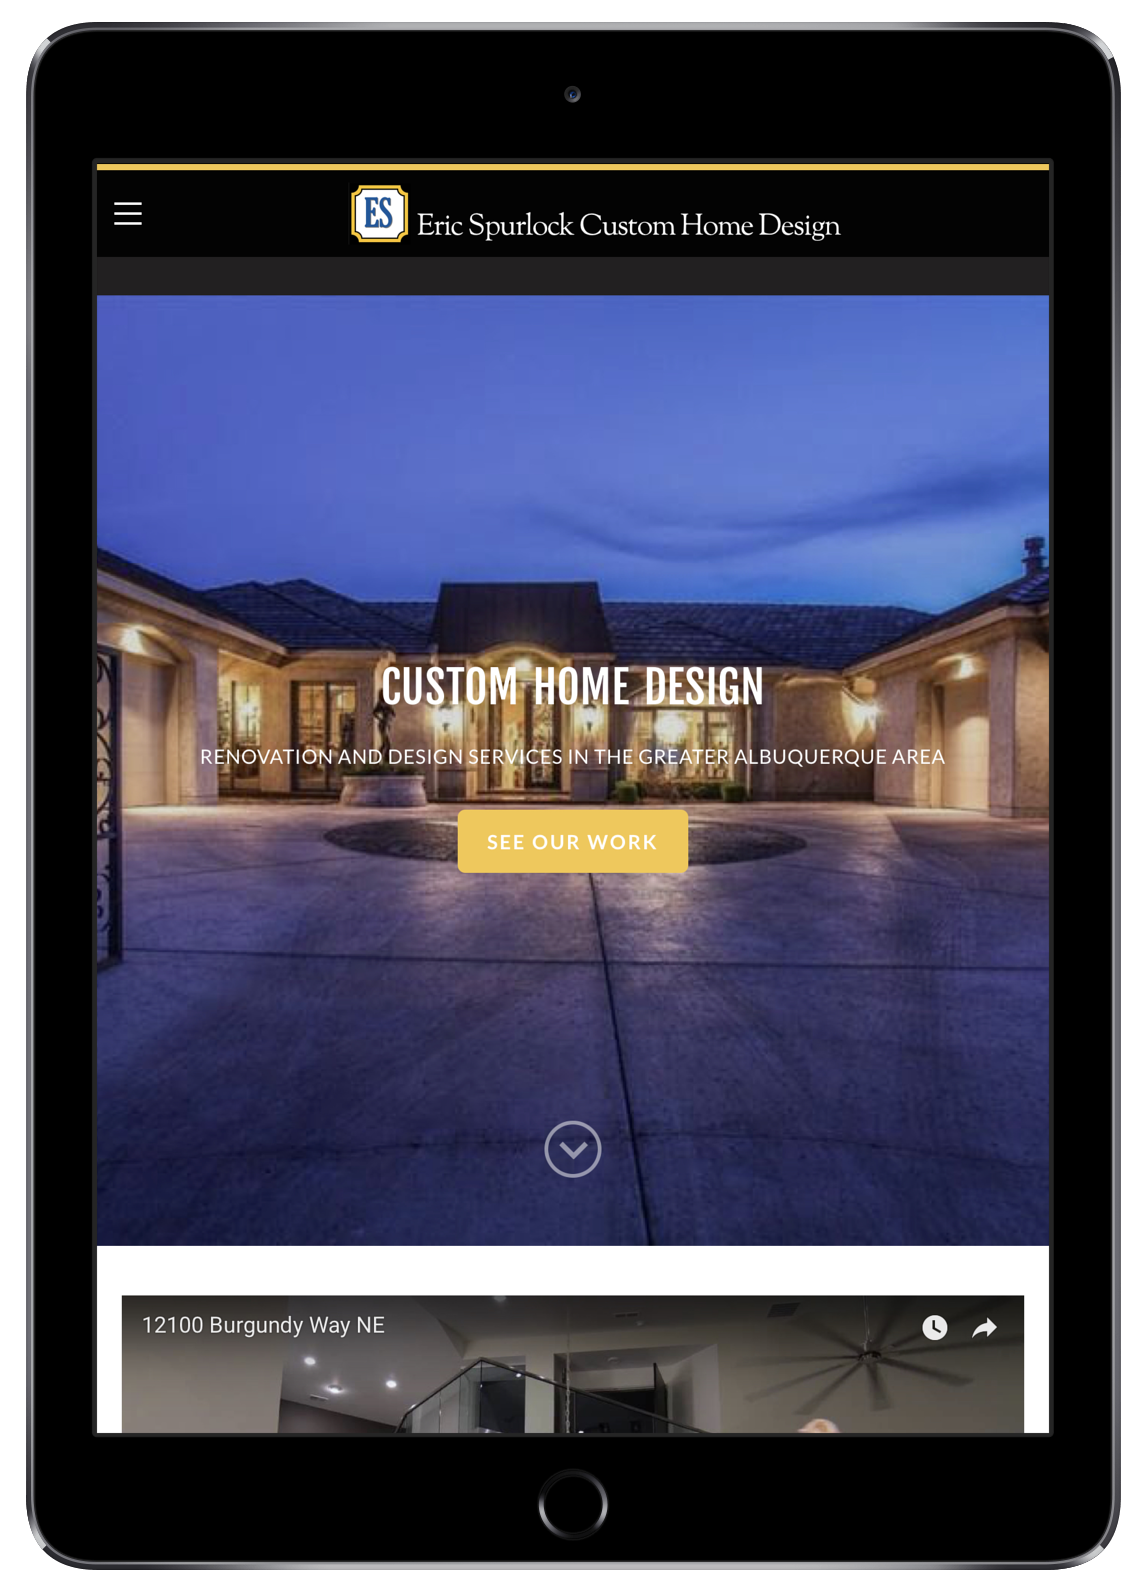 Eric Spurlock Custom Home Design on iPad